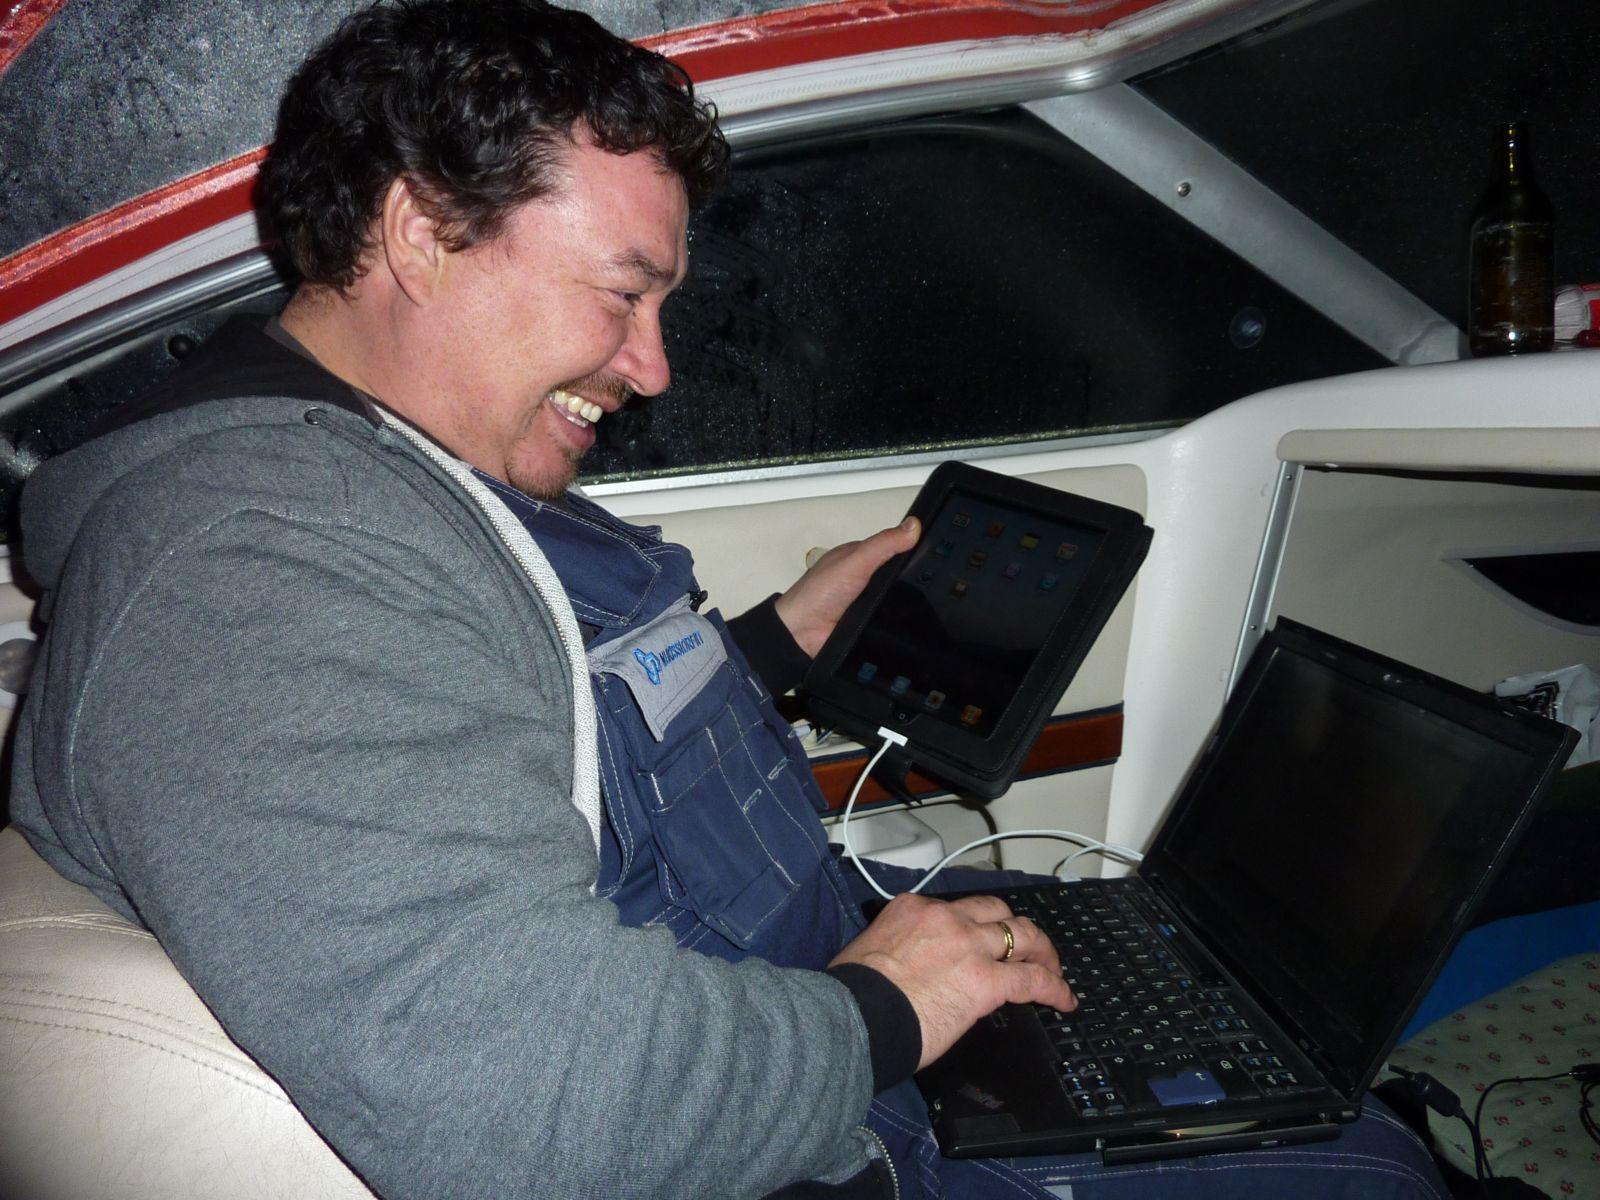 2010-10-28-2201_Alu checker sin Ipad i båden_Gunnar _Alu_ Petrussen